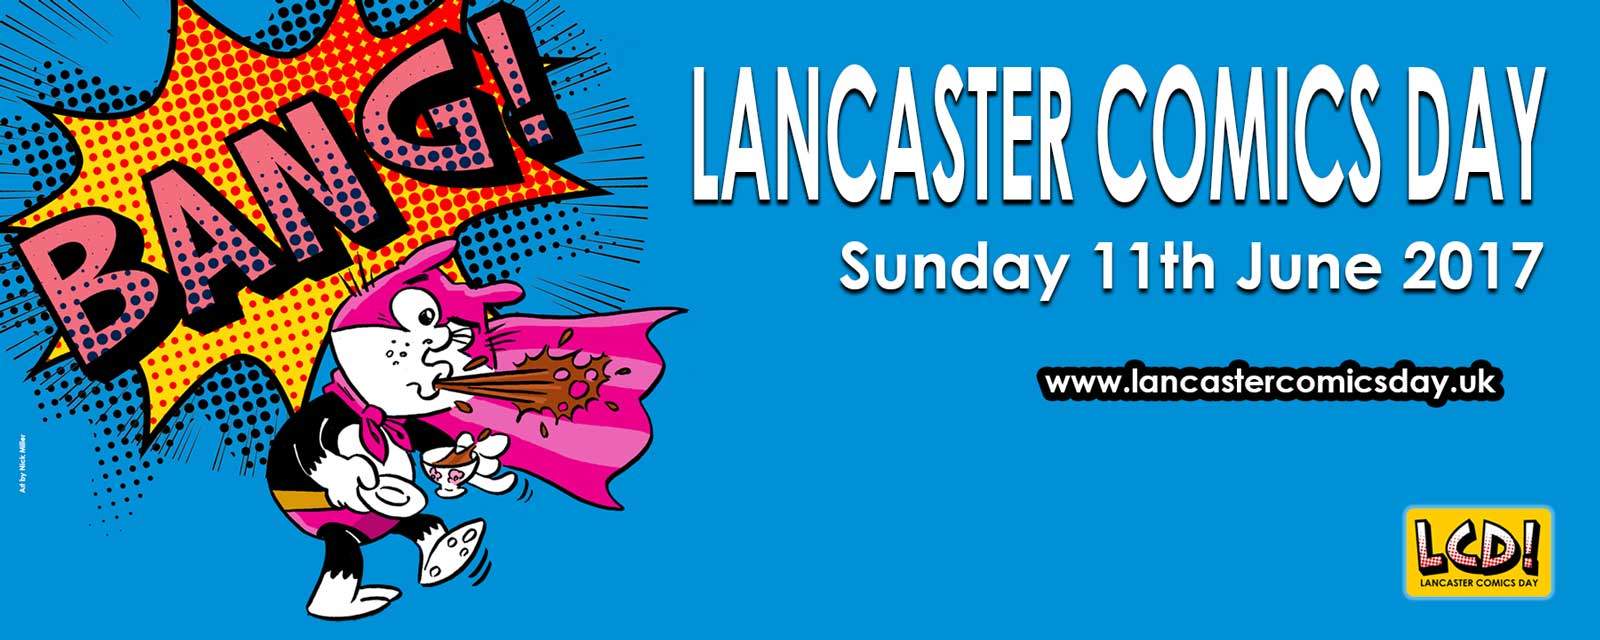 Lancaster Comics Day 2017 Promotional Art